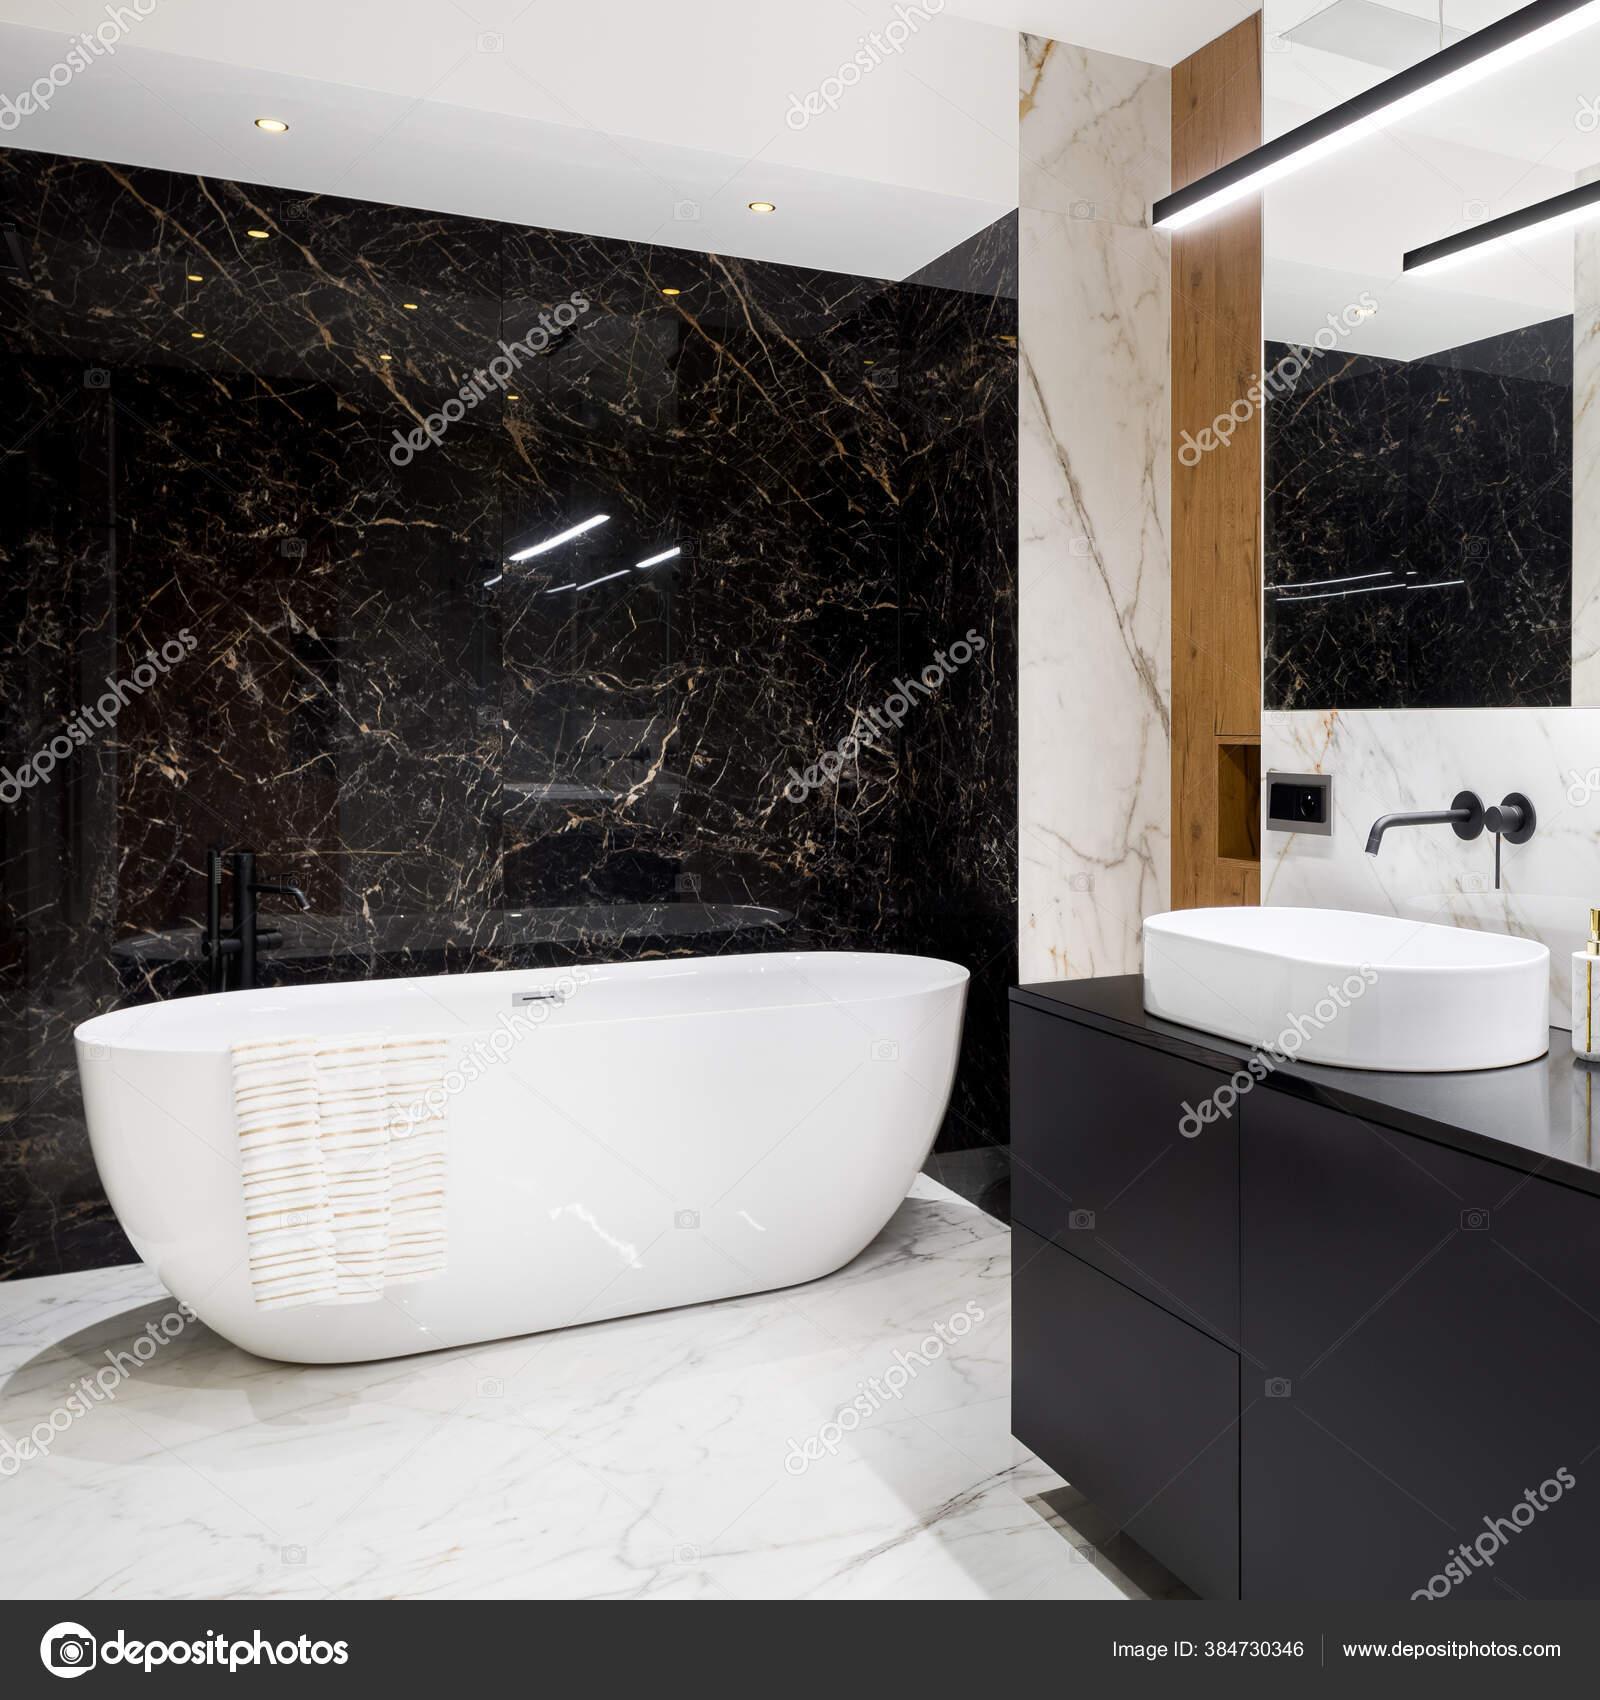 Luxury Stylish Bathroom Black White Marble Tiles Big Oval Bathtub Stock Photo C In4mal 384730346